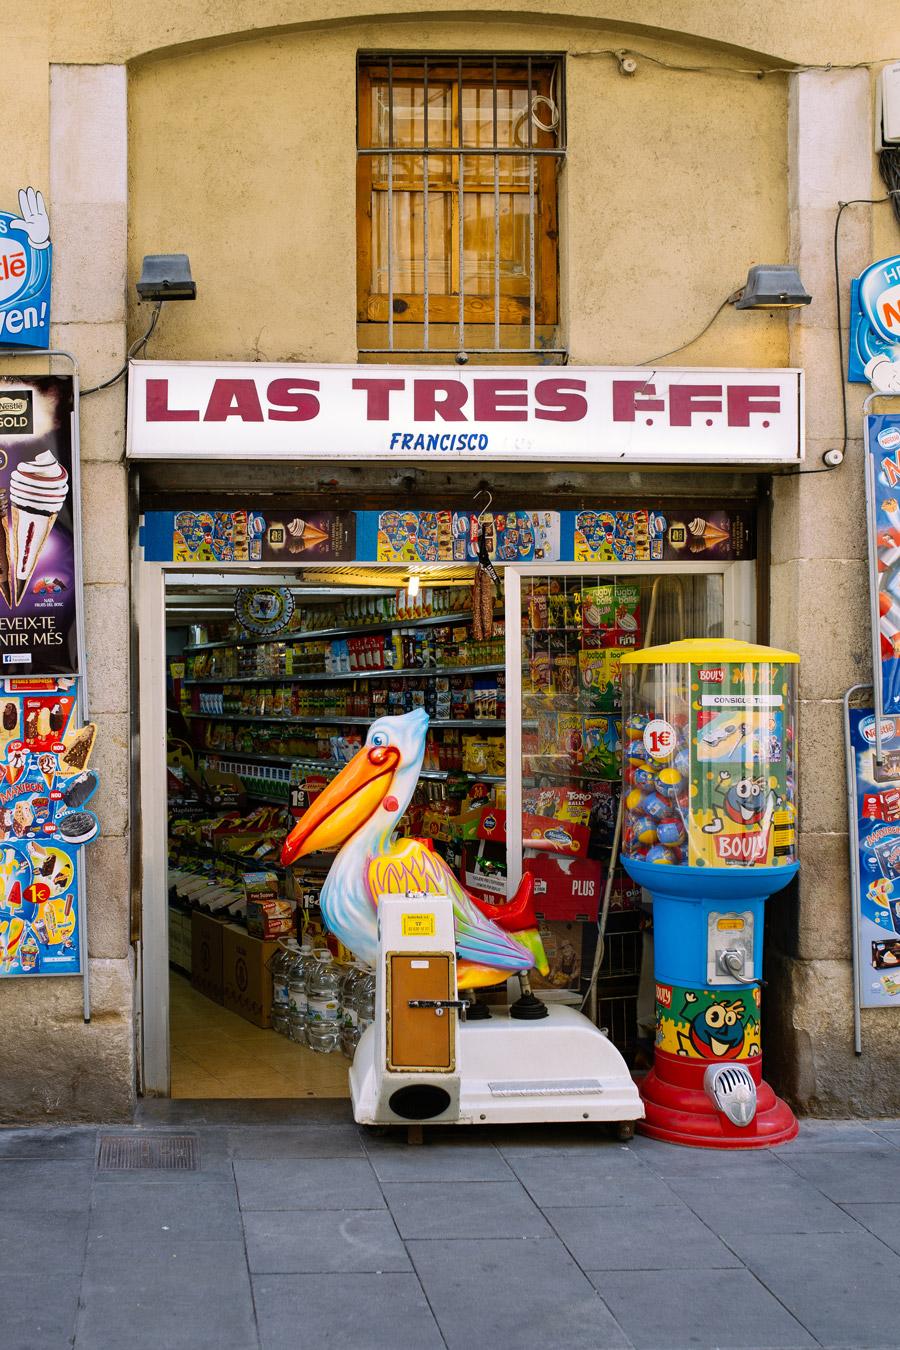 barcelona_bx_06.jpg